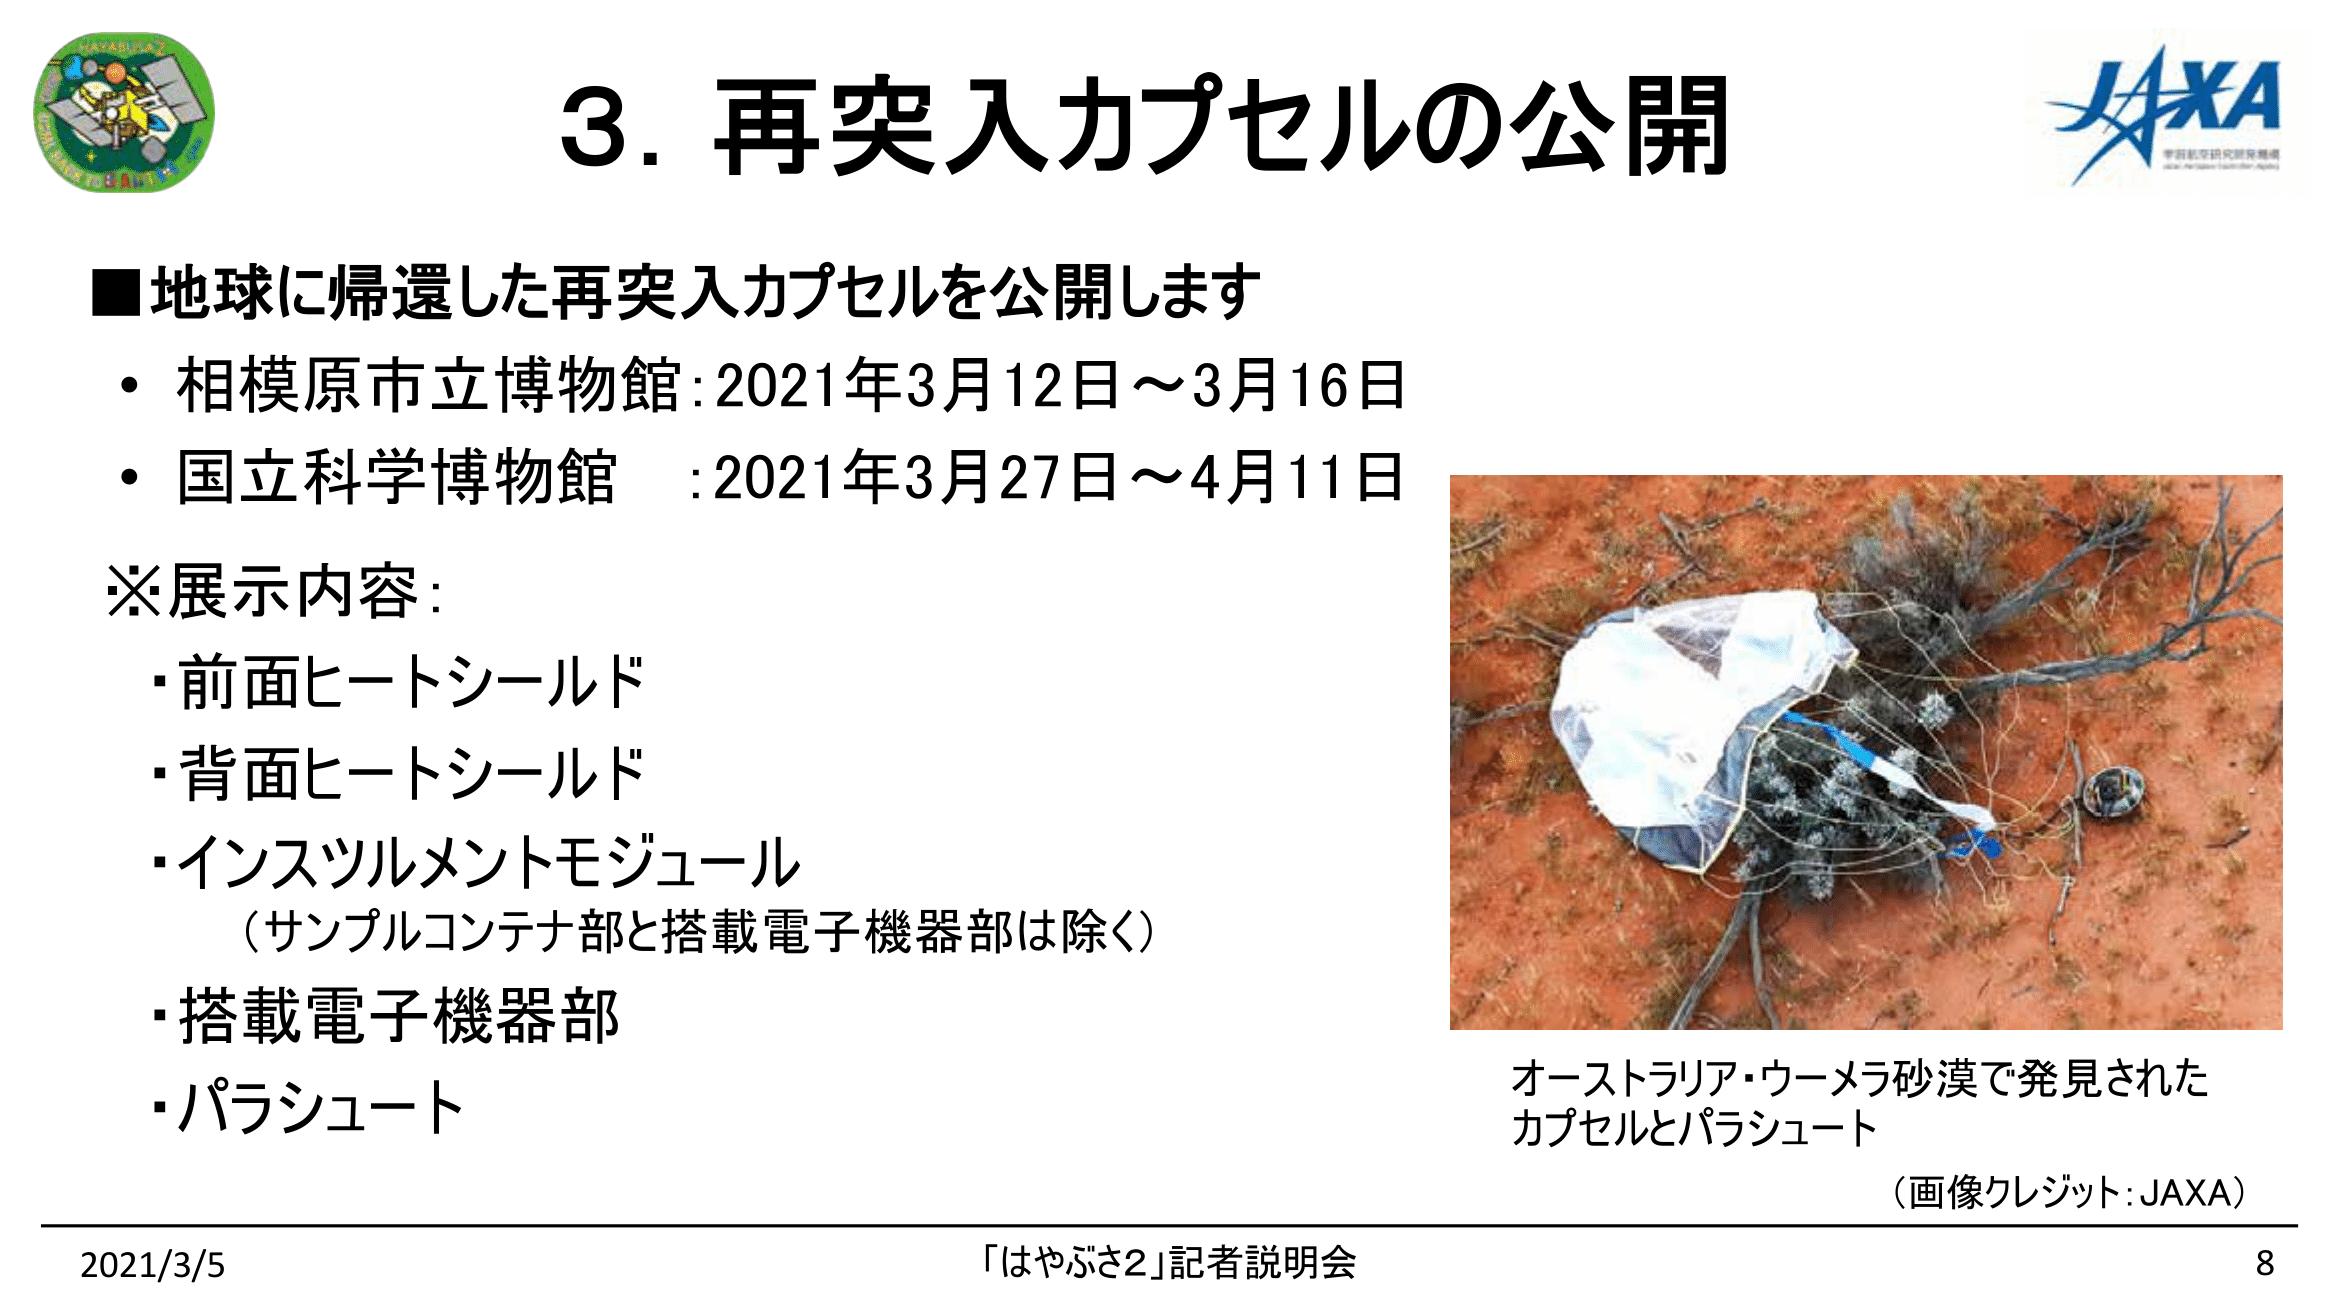 f:id:Imamura:20210305134126p:plain